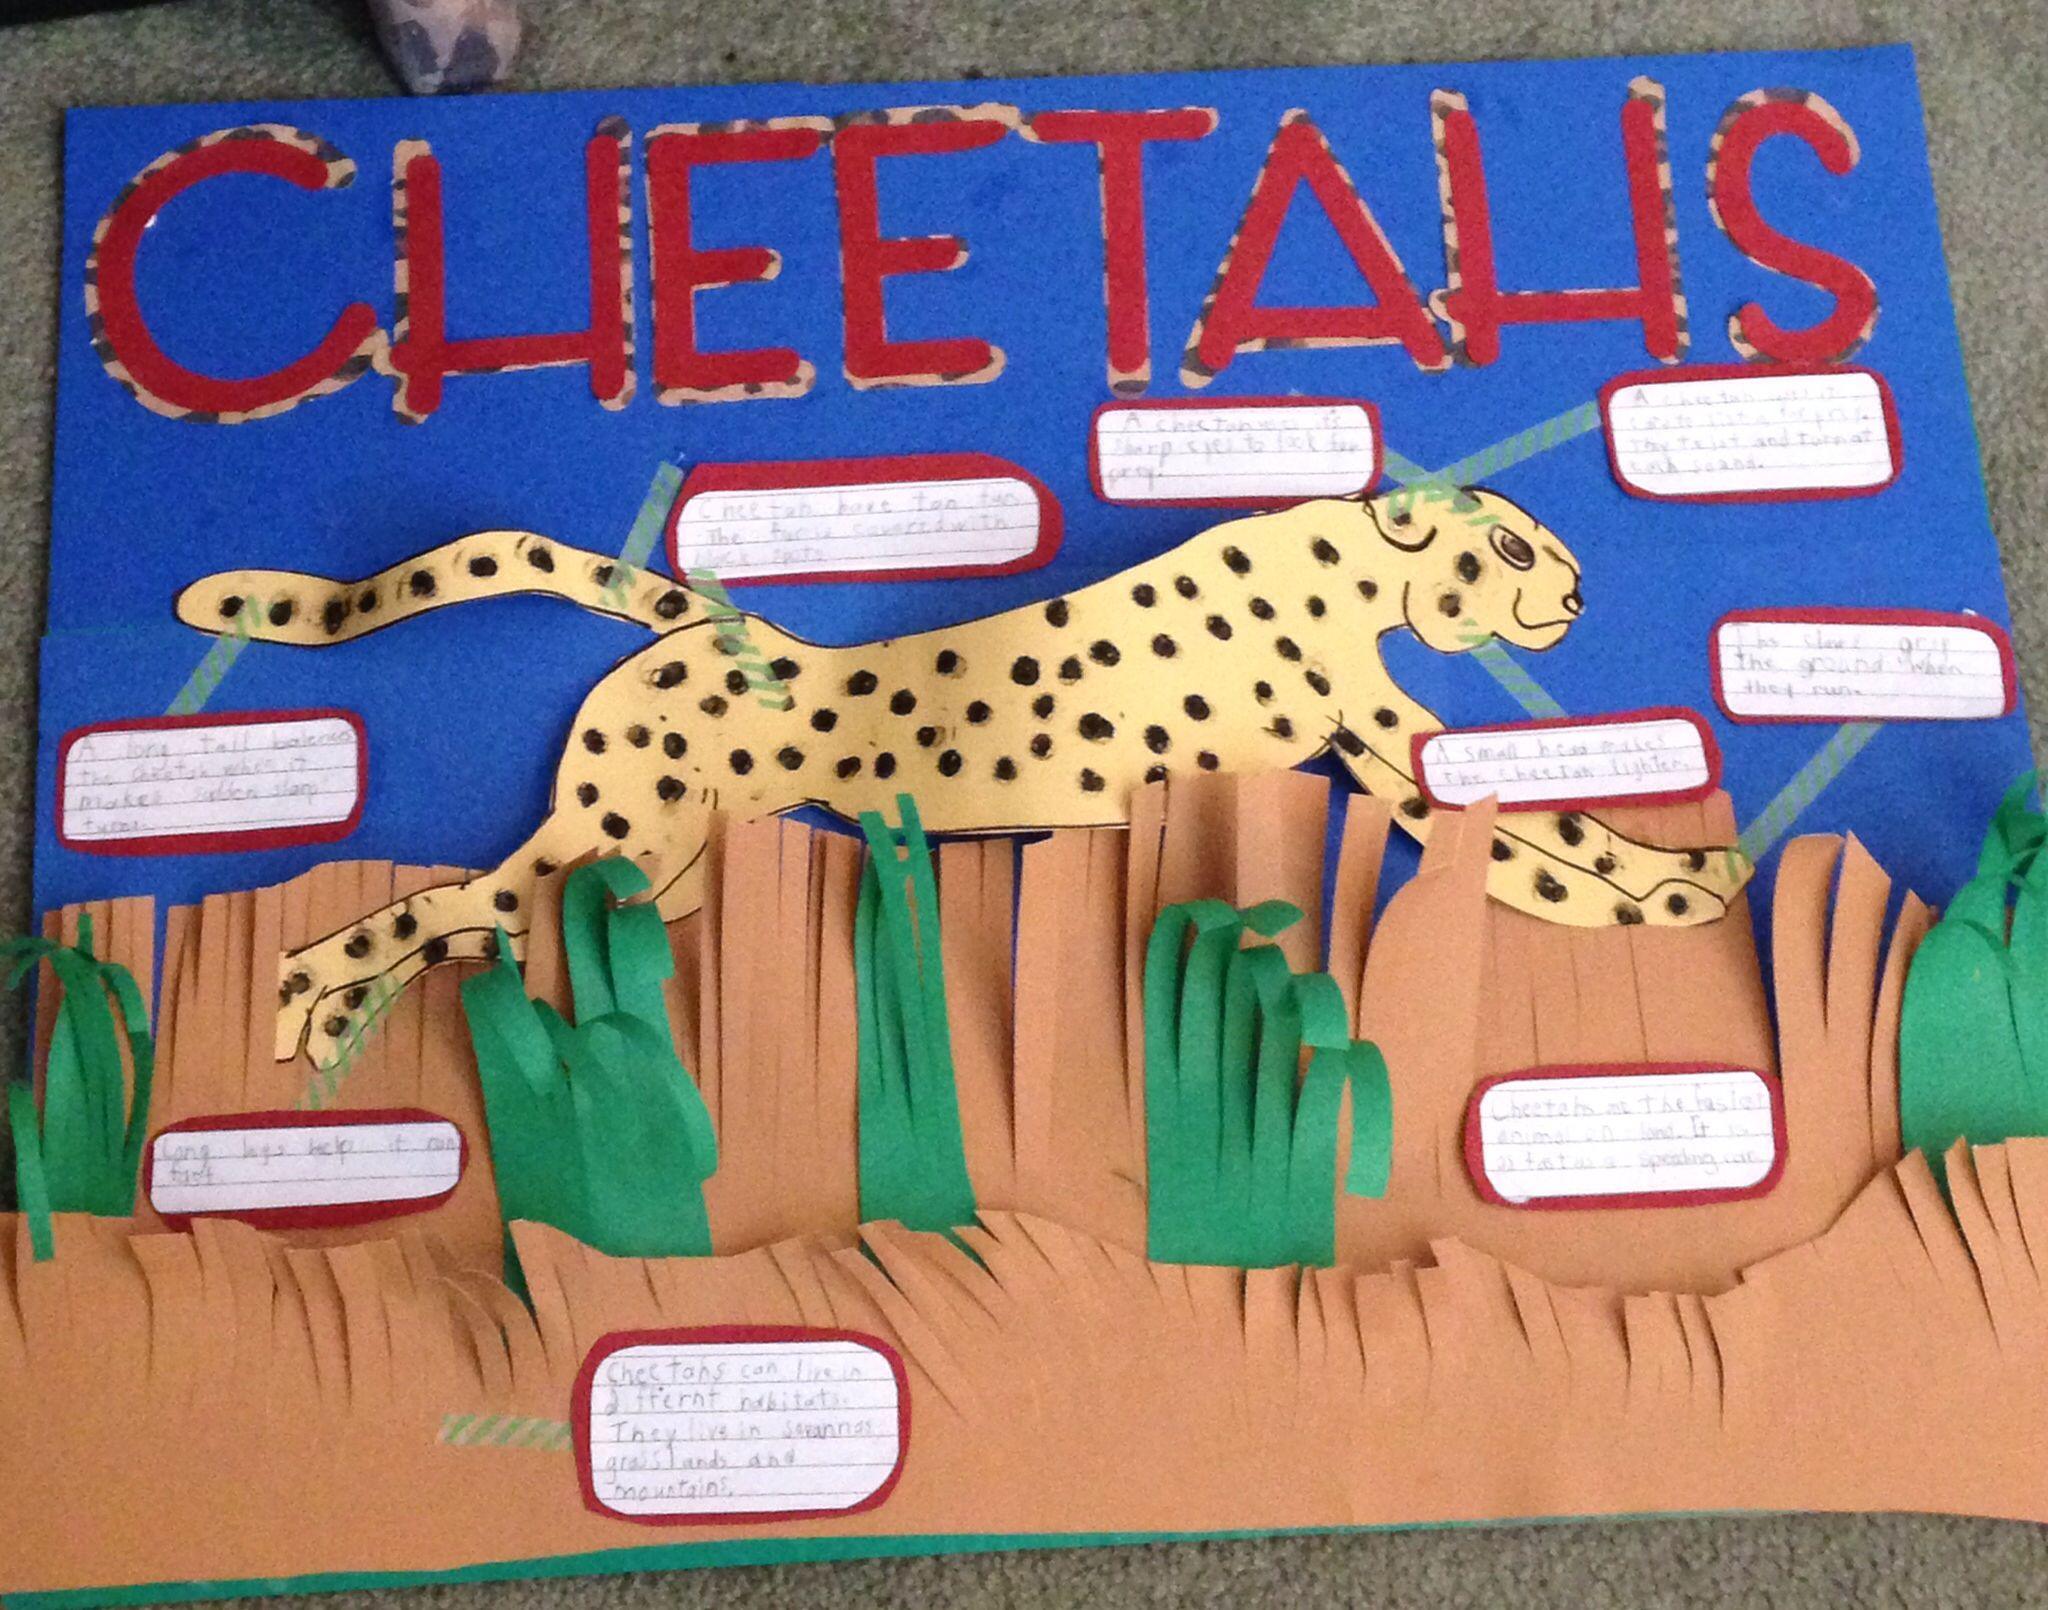 Cheetah School Project Ideas